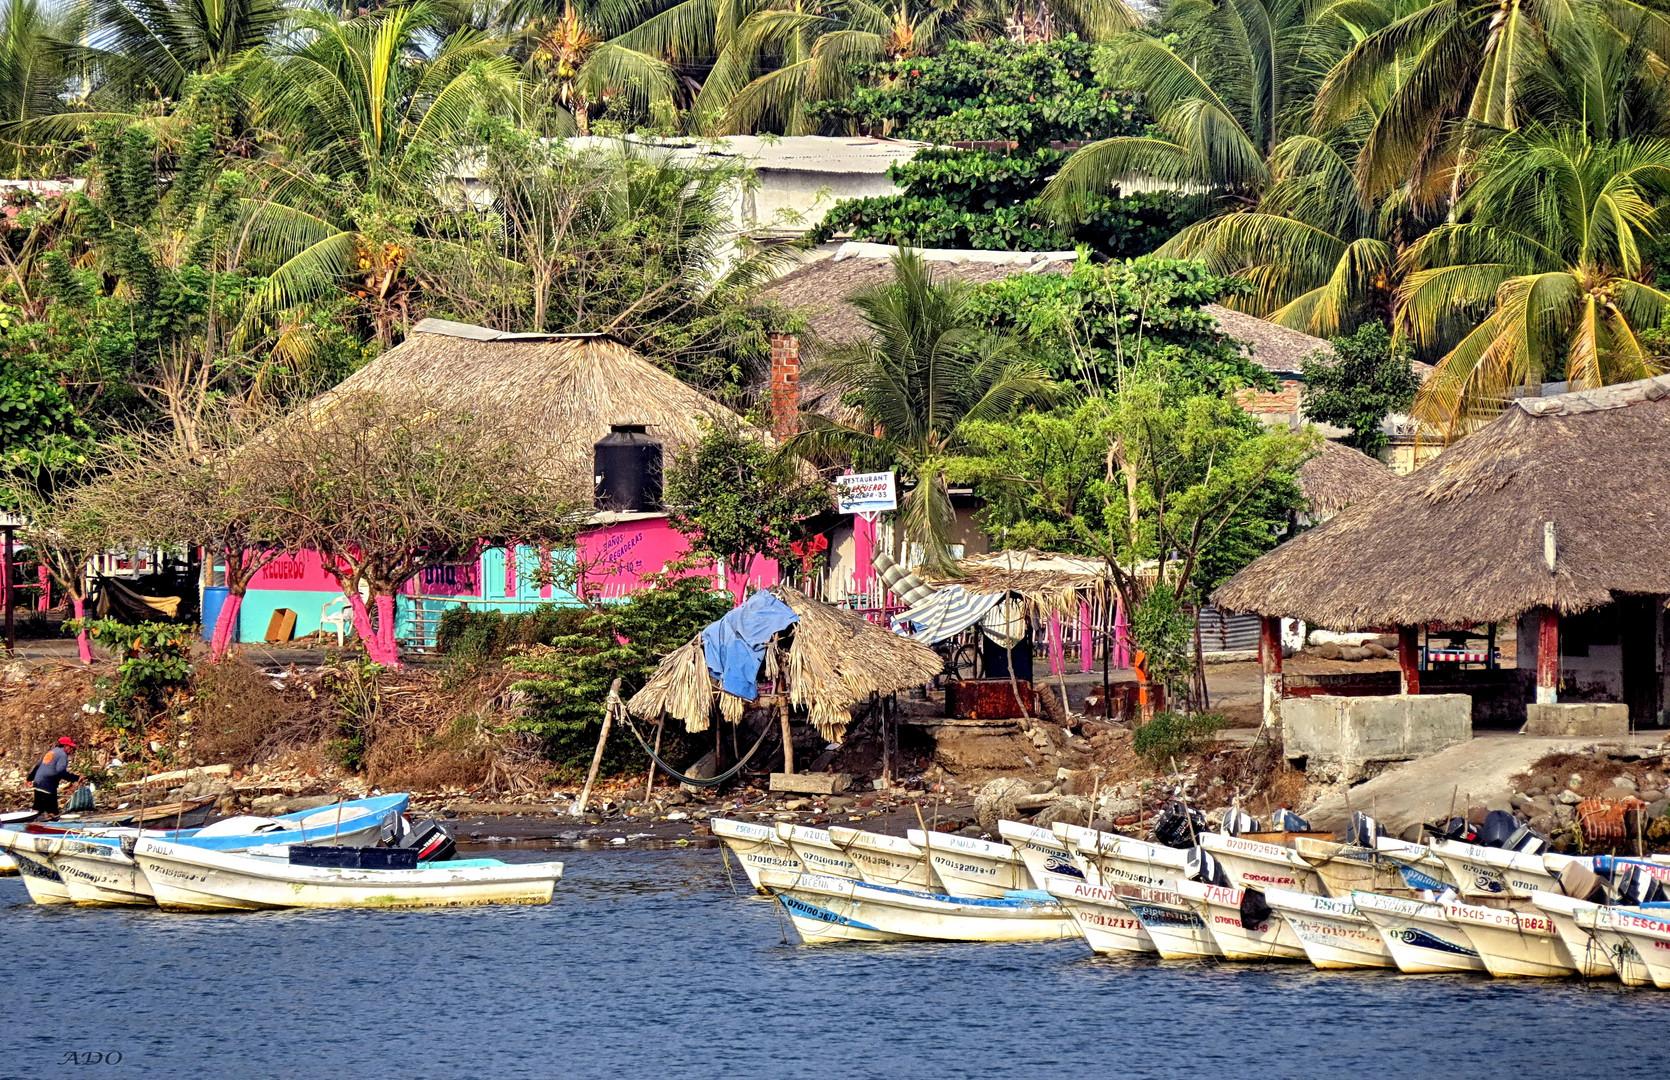 The Little Fishing Village